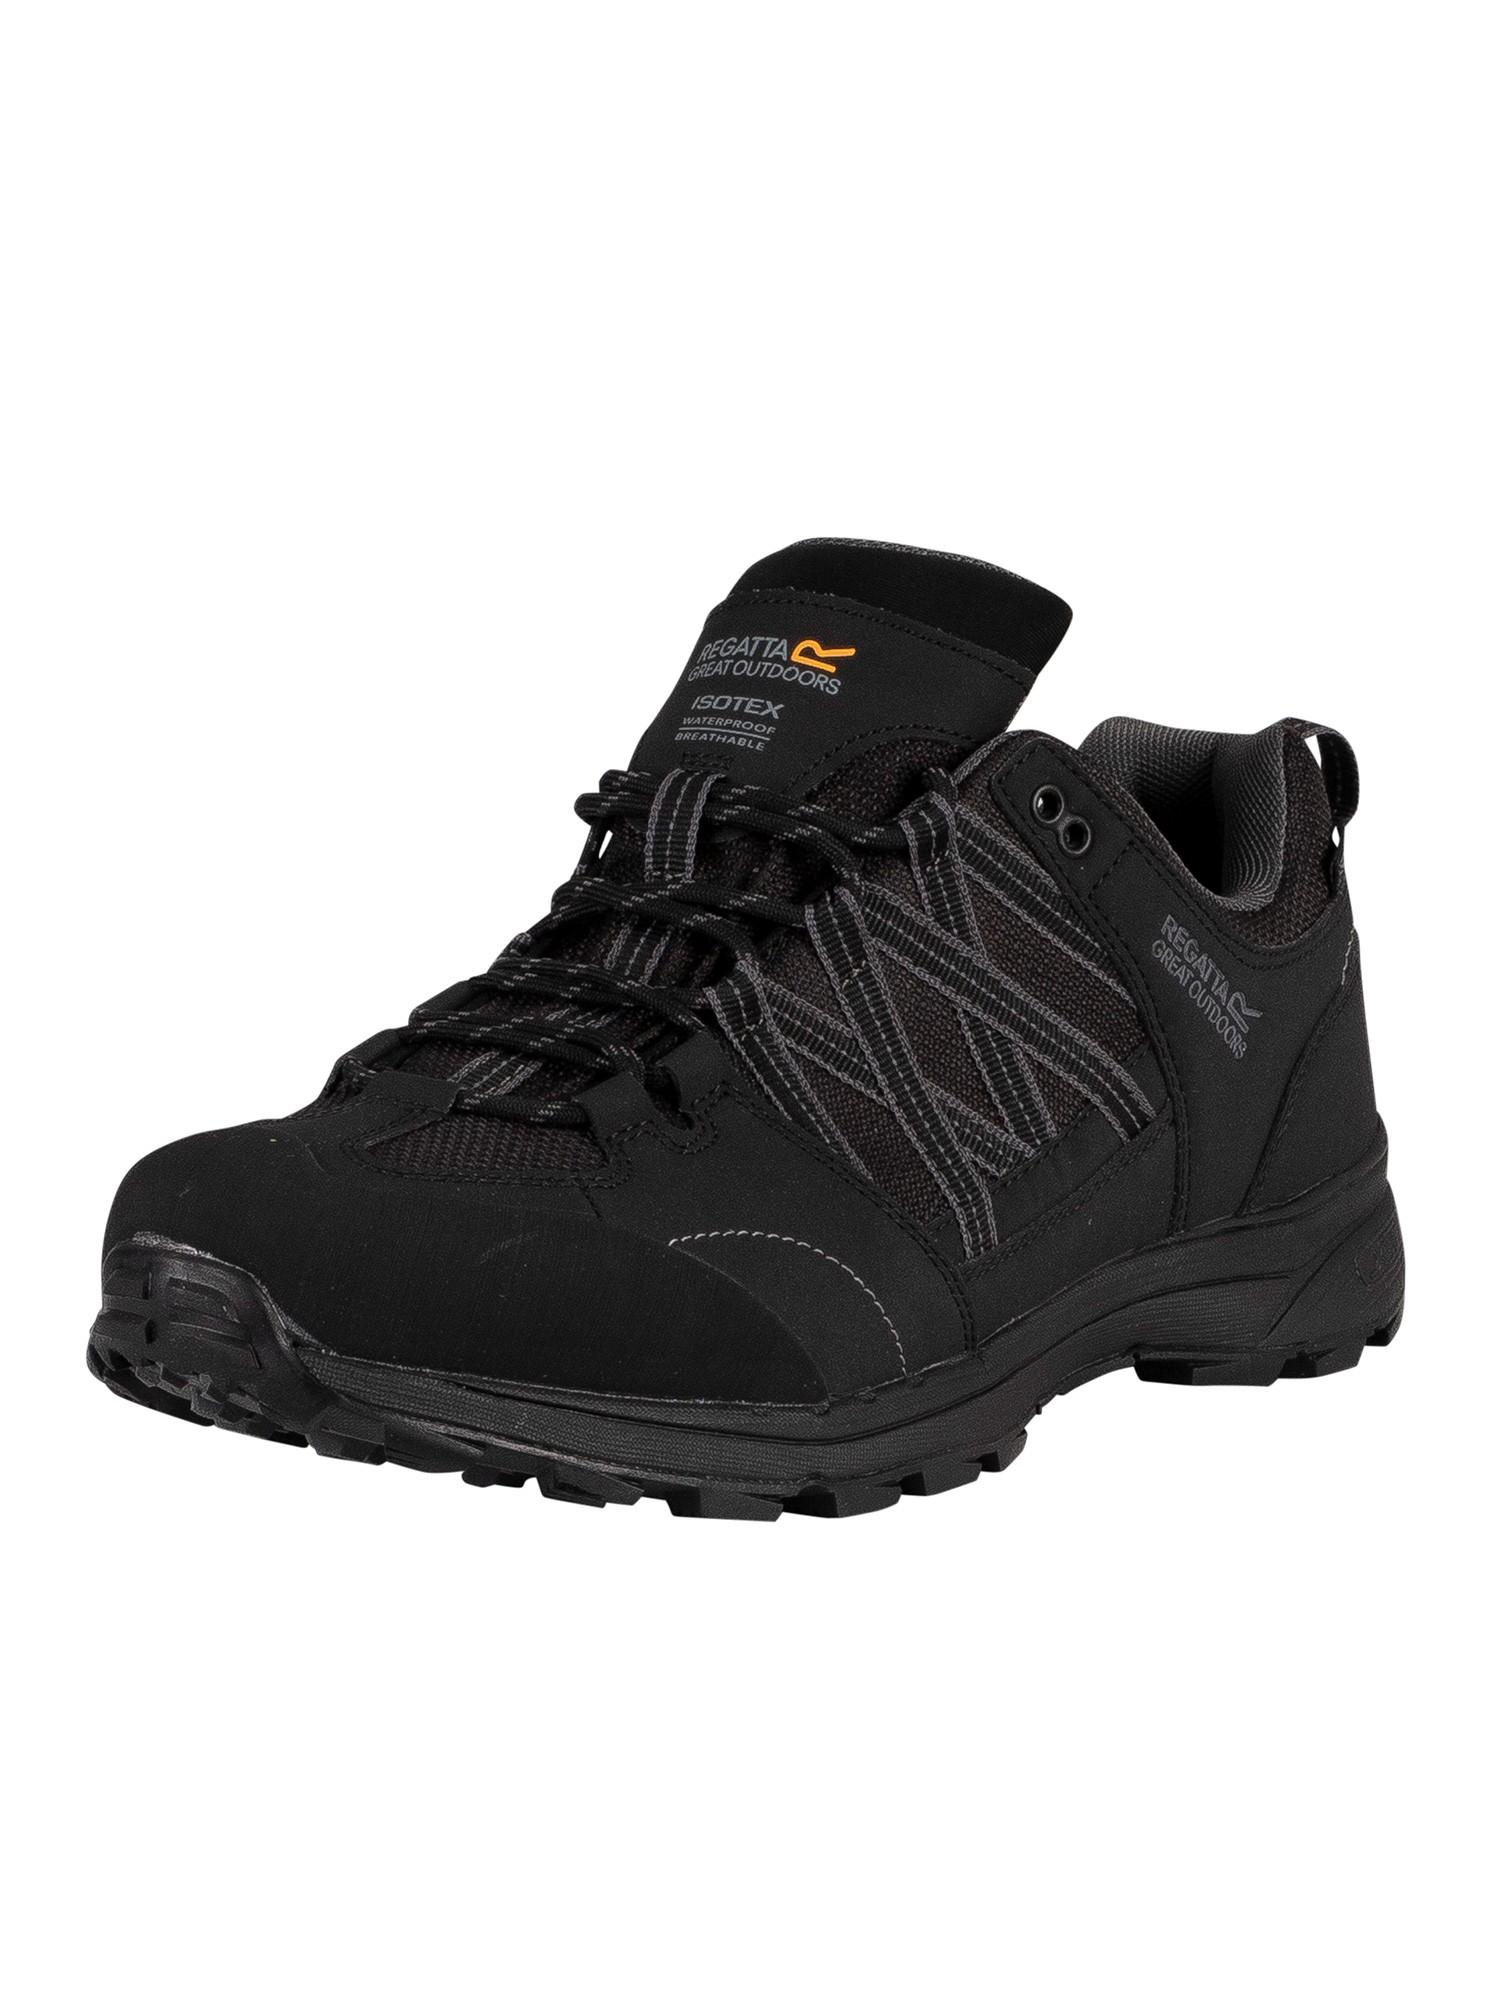 Samaris II Low Walking Boots